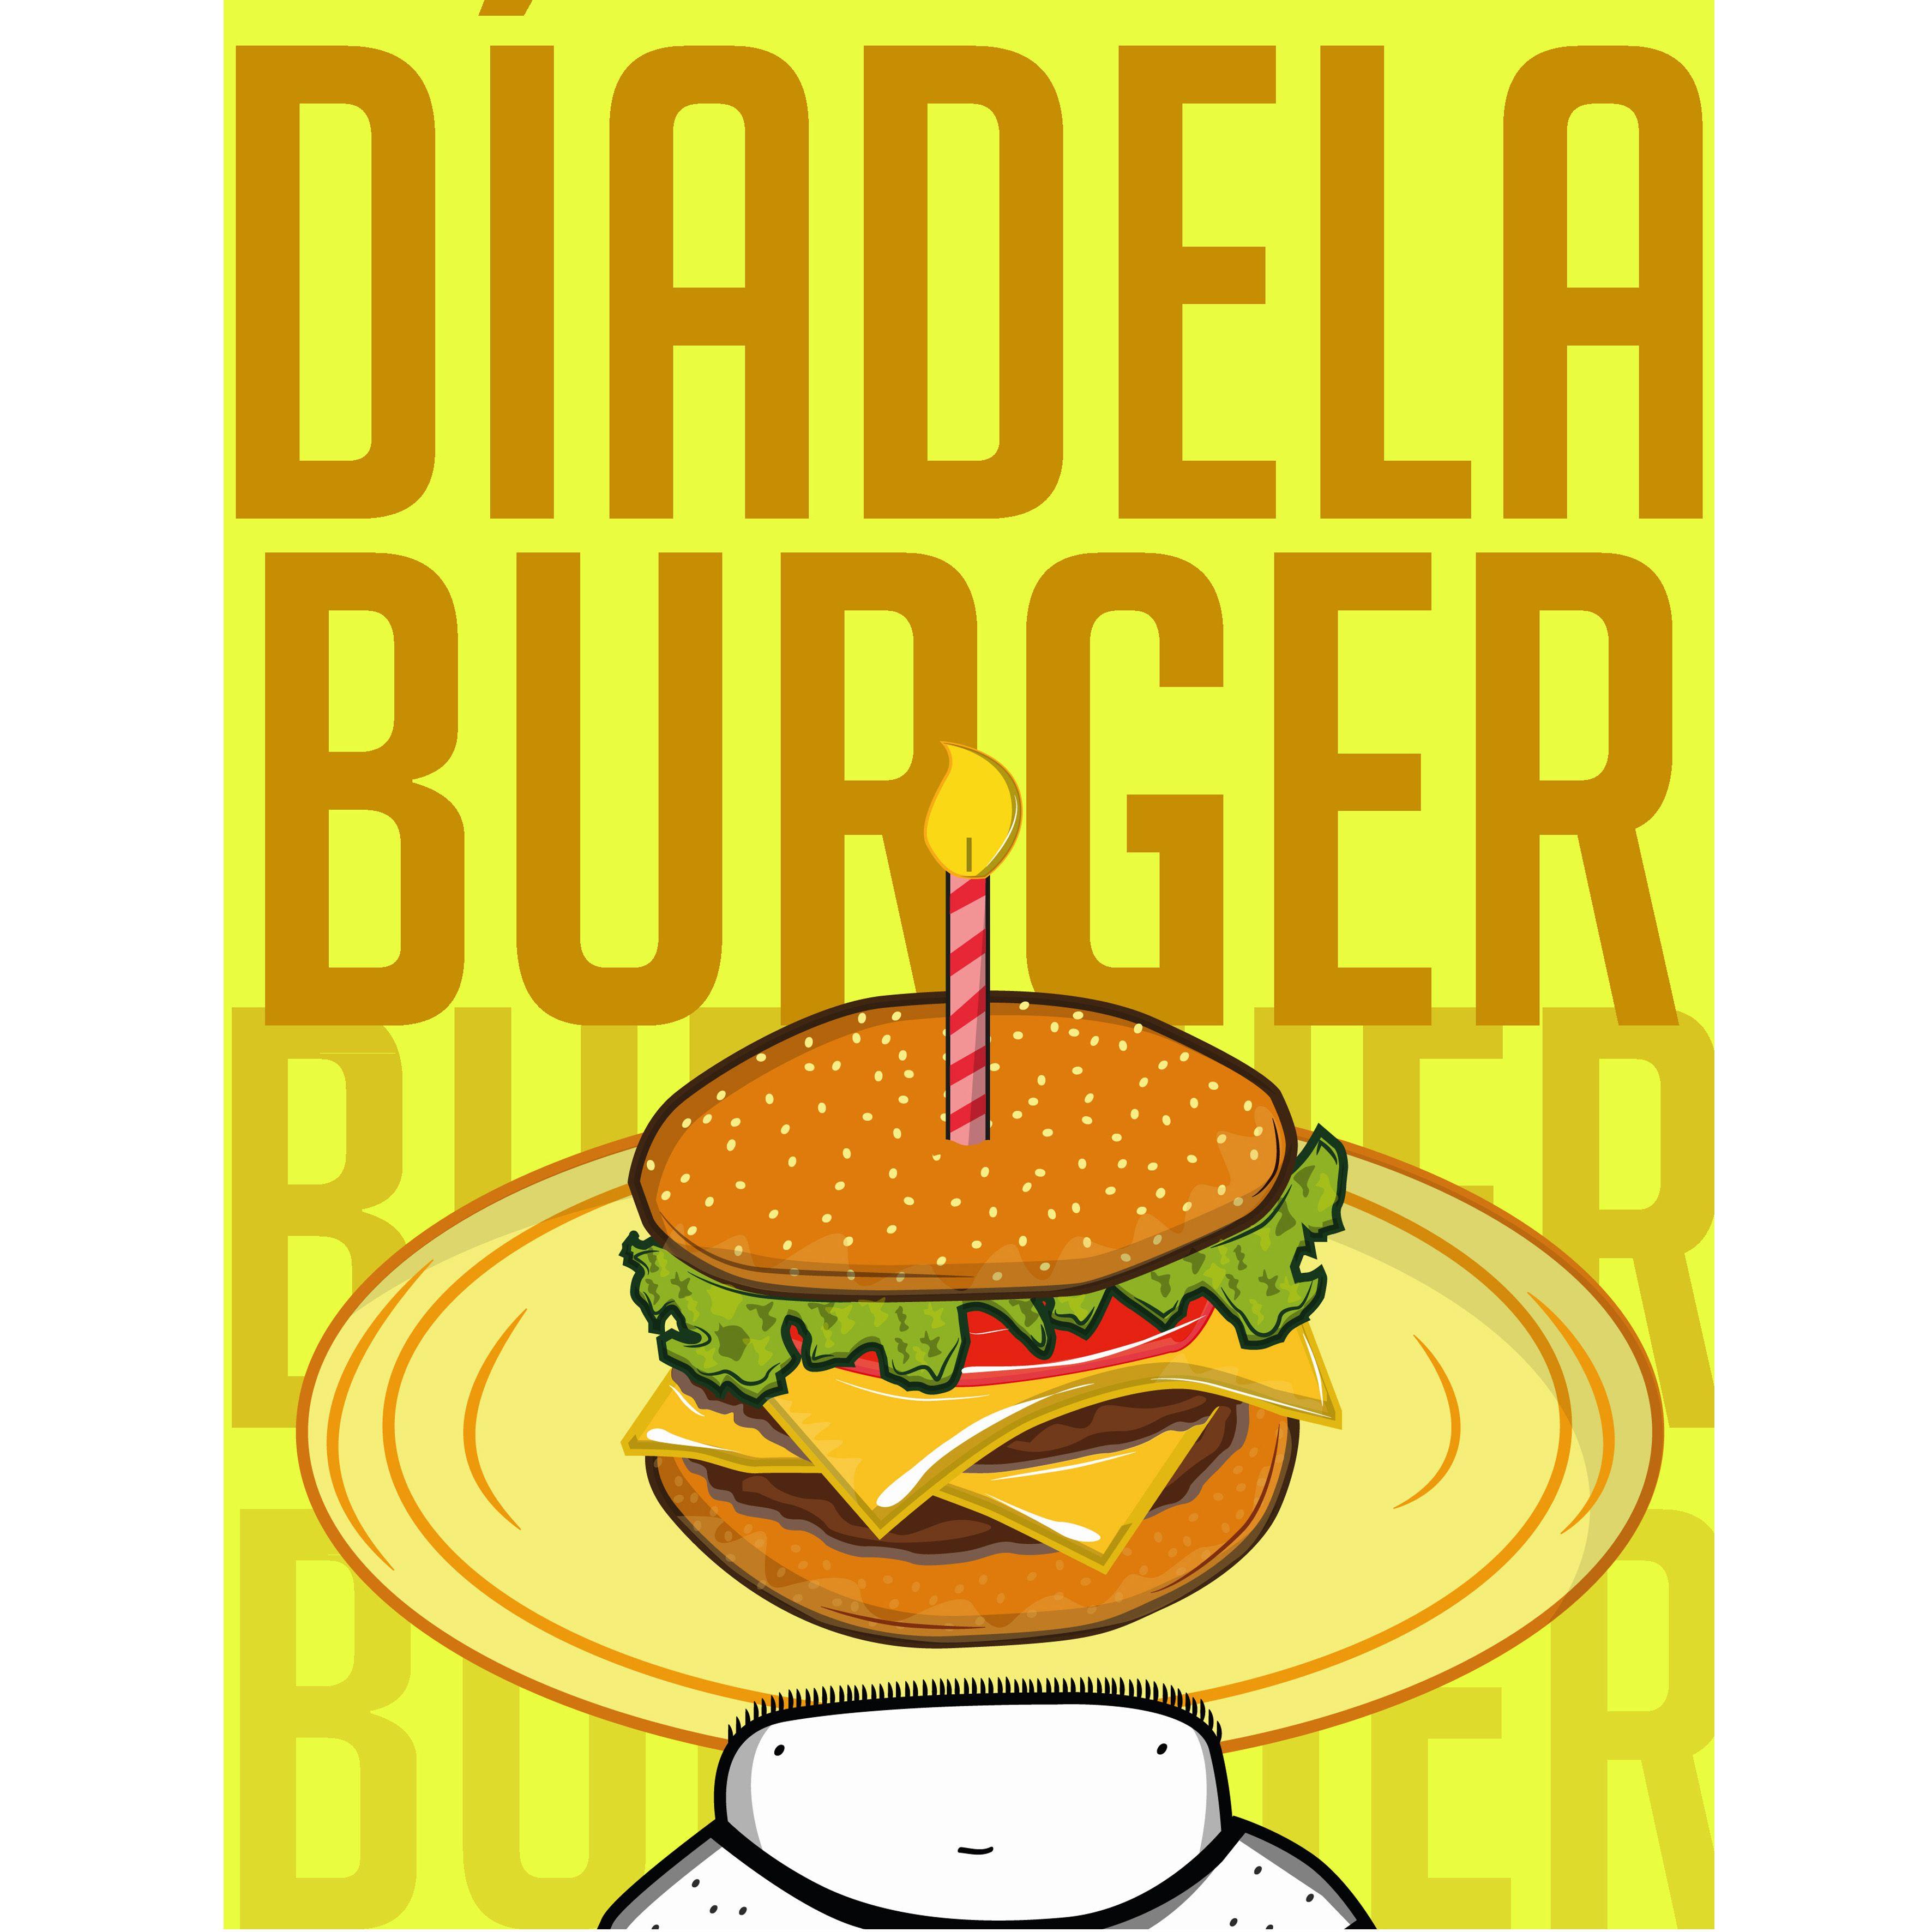 día de la hamburguesa!!! yuhuu!! | Hamburguesas, Divertido